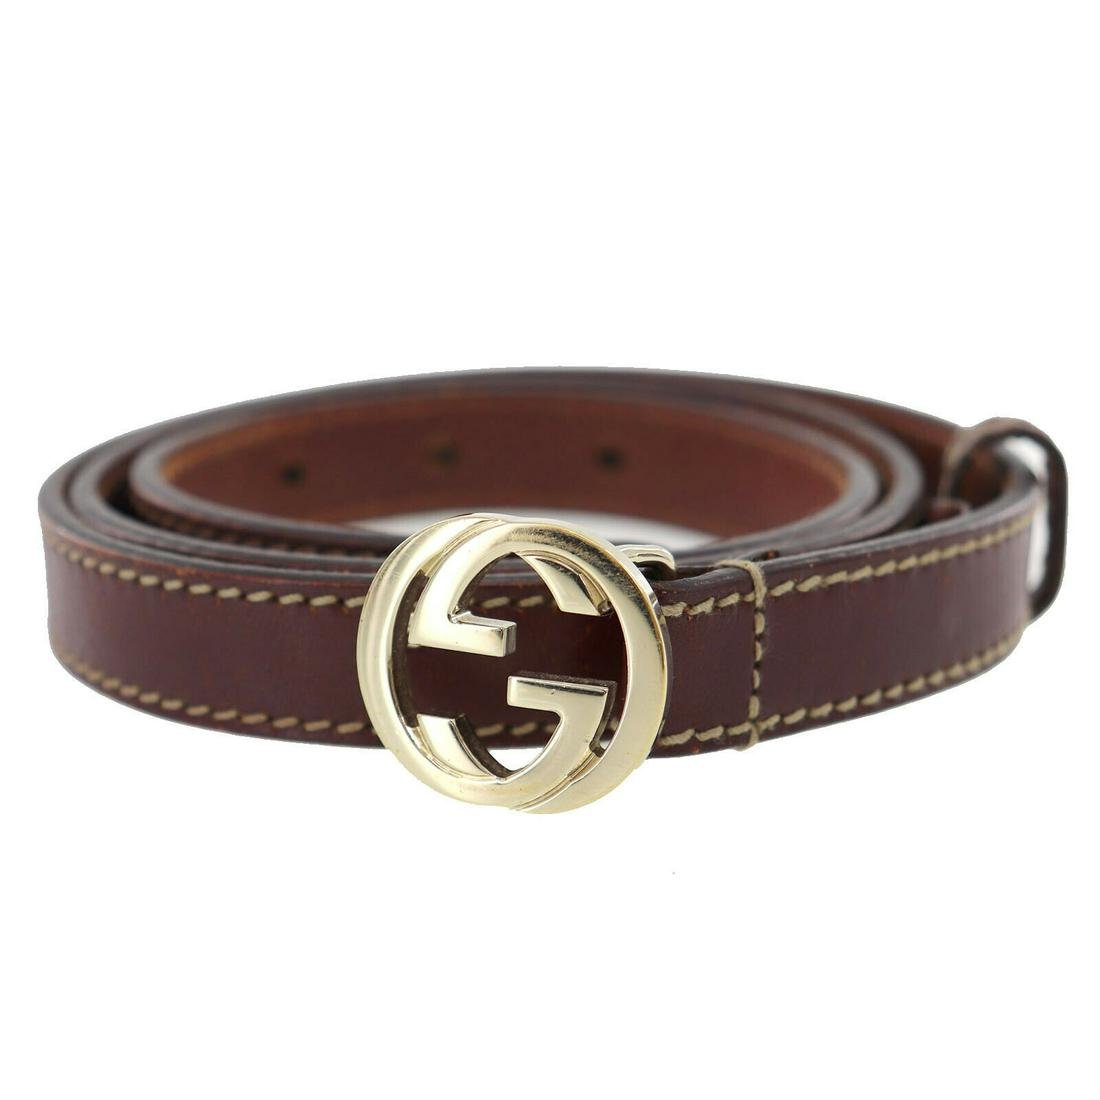 Authentic GUCCI VINTAGE GG Logos Belt